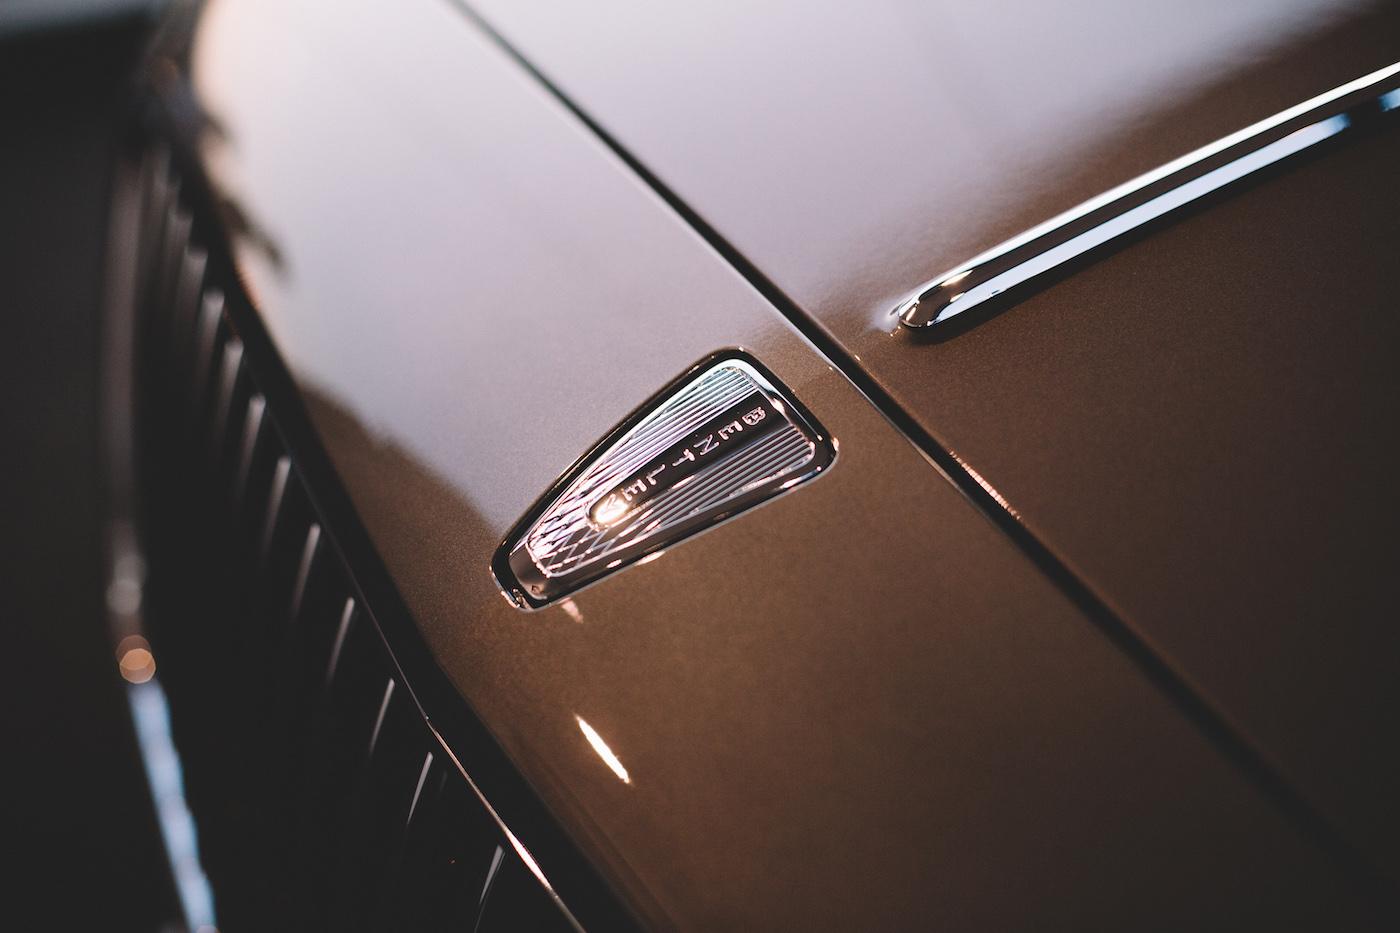 Mit Bentley in Porto Cervo: Die Bentley Summer Tour 2019 19